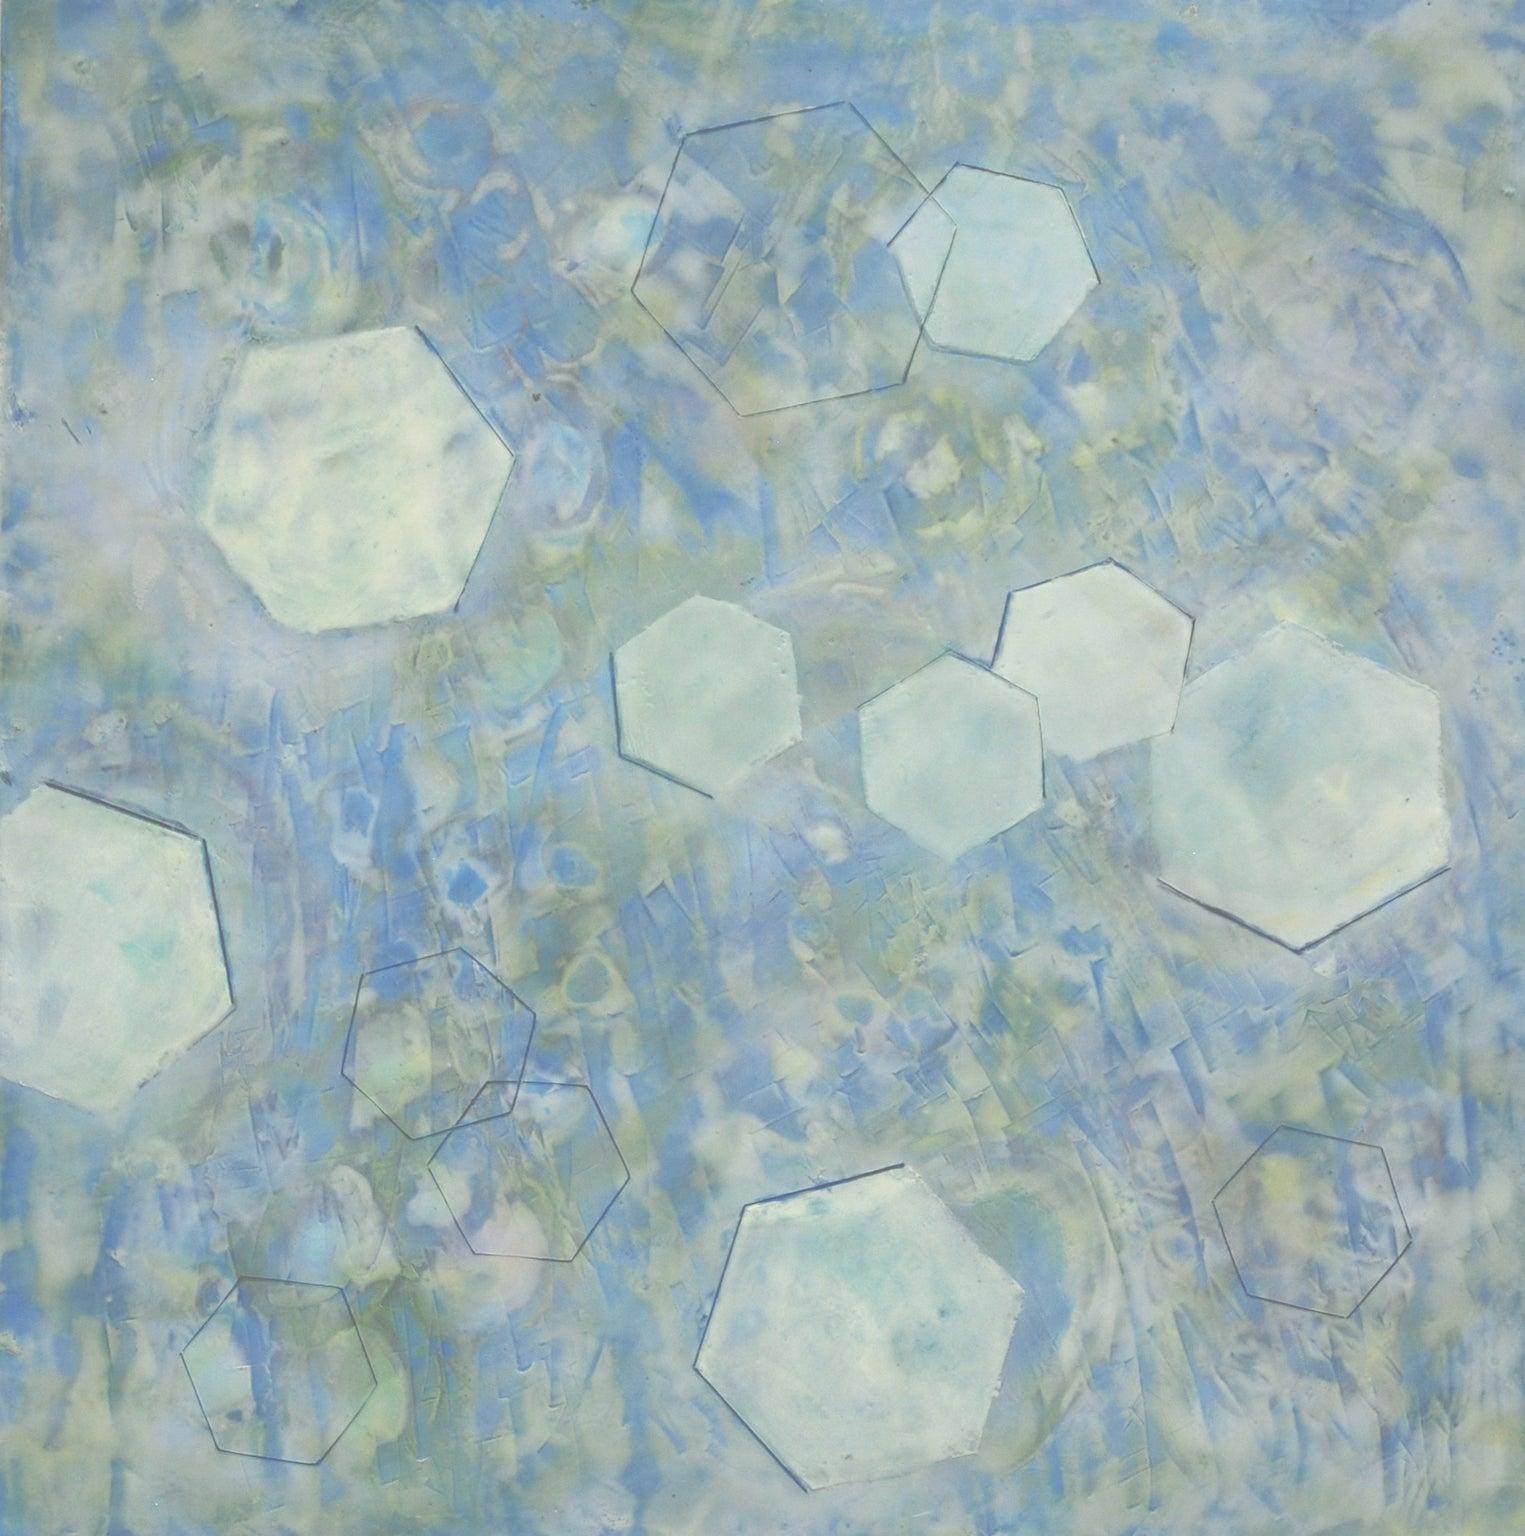 """Bio Patterns 3"", encaustic, pastel, geometric, abstract, microscopic, blues"